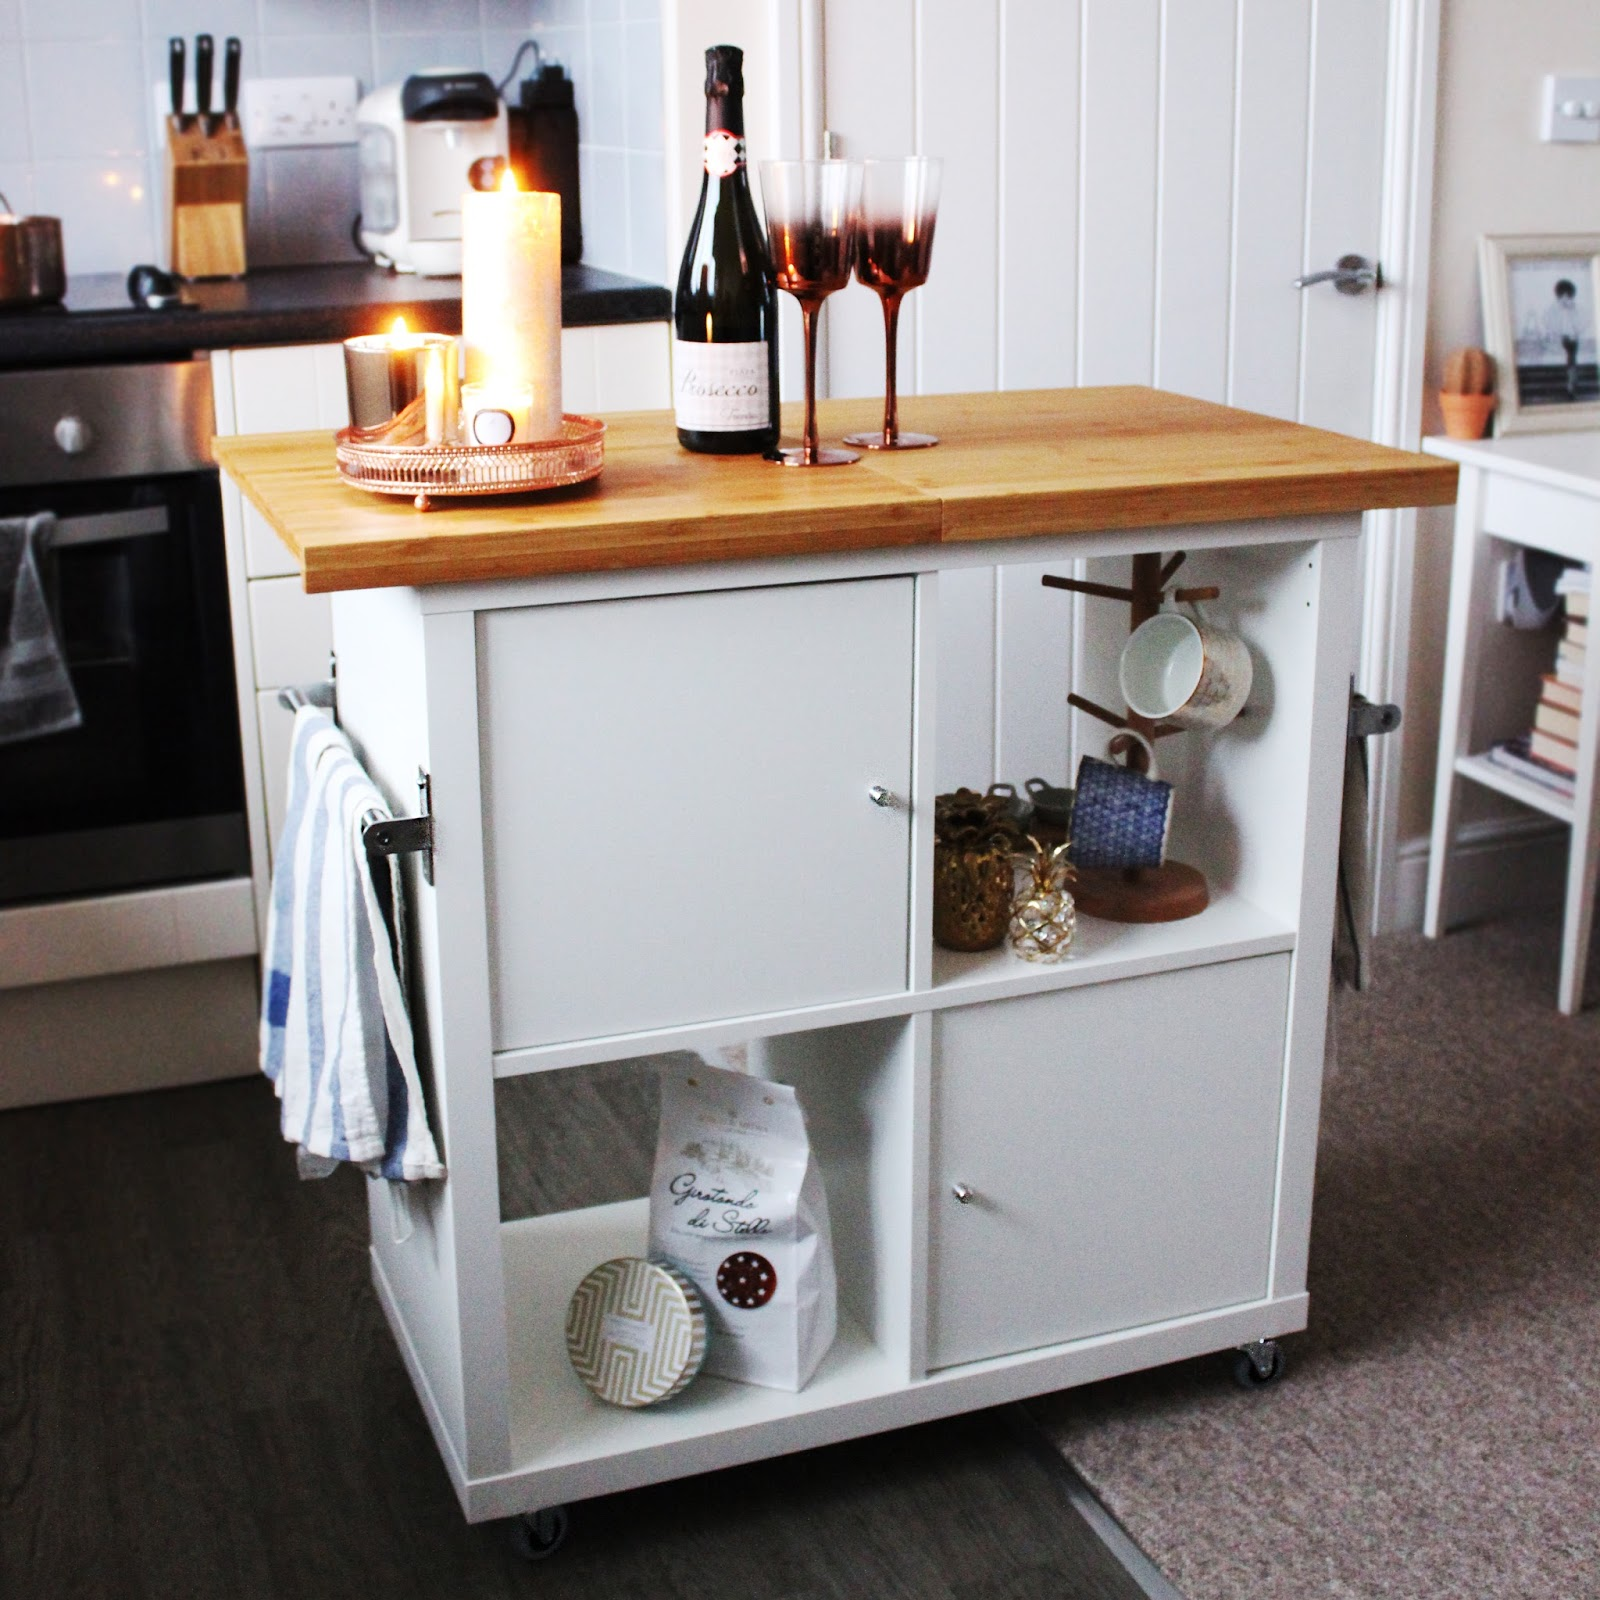 Ikea Kallax Kitchen Island Hack | Jen Lou Meredith